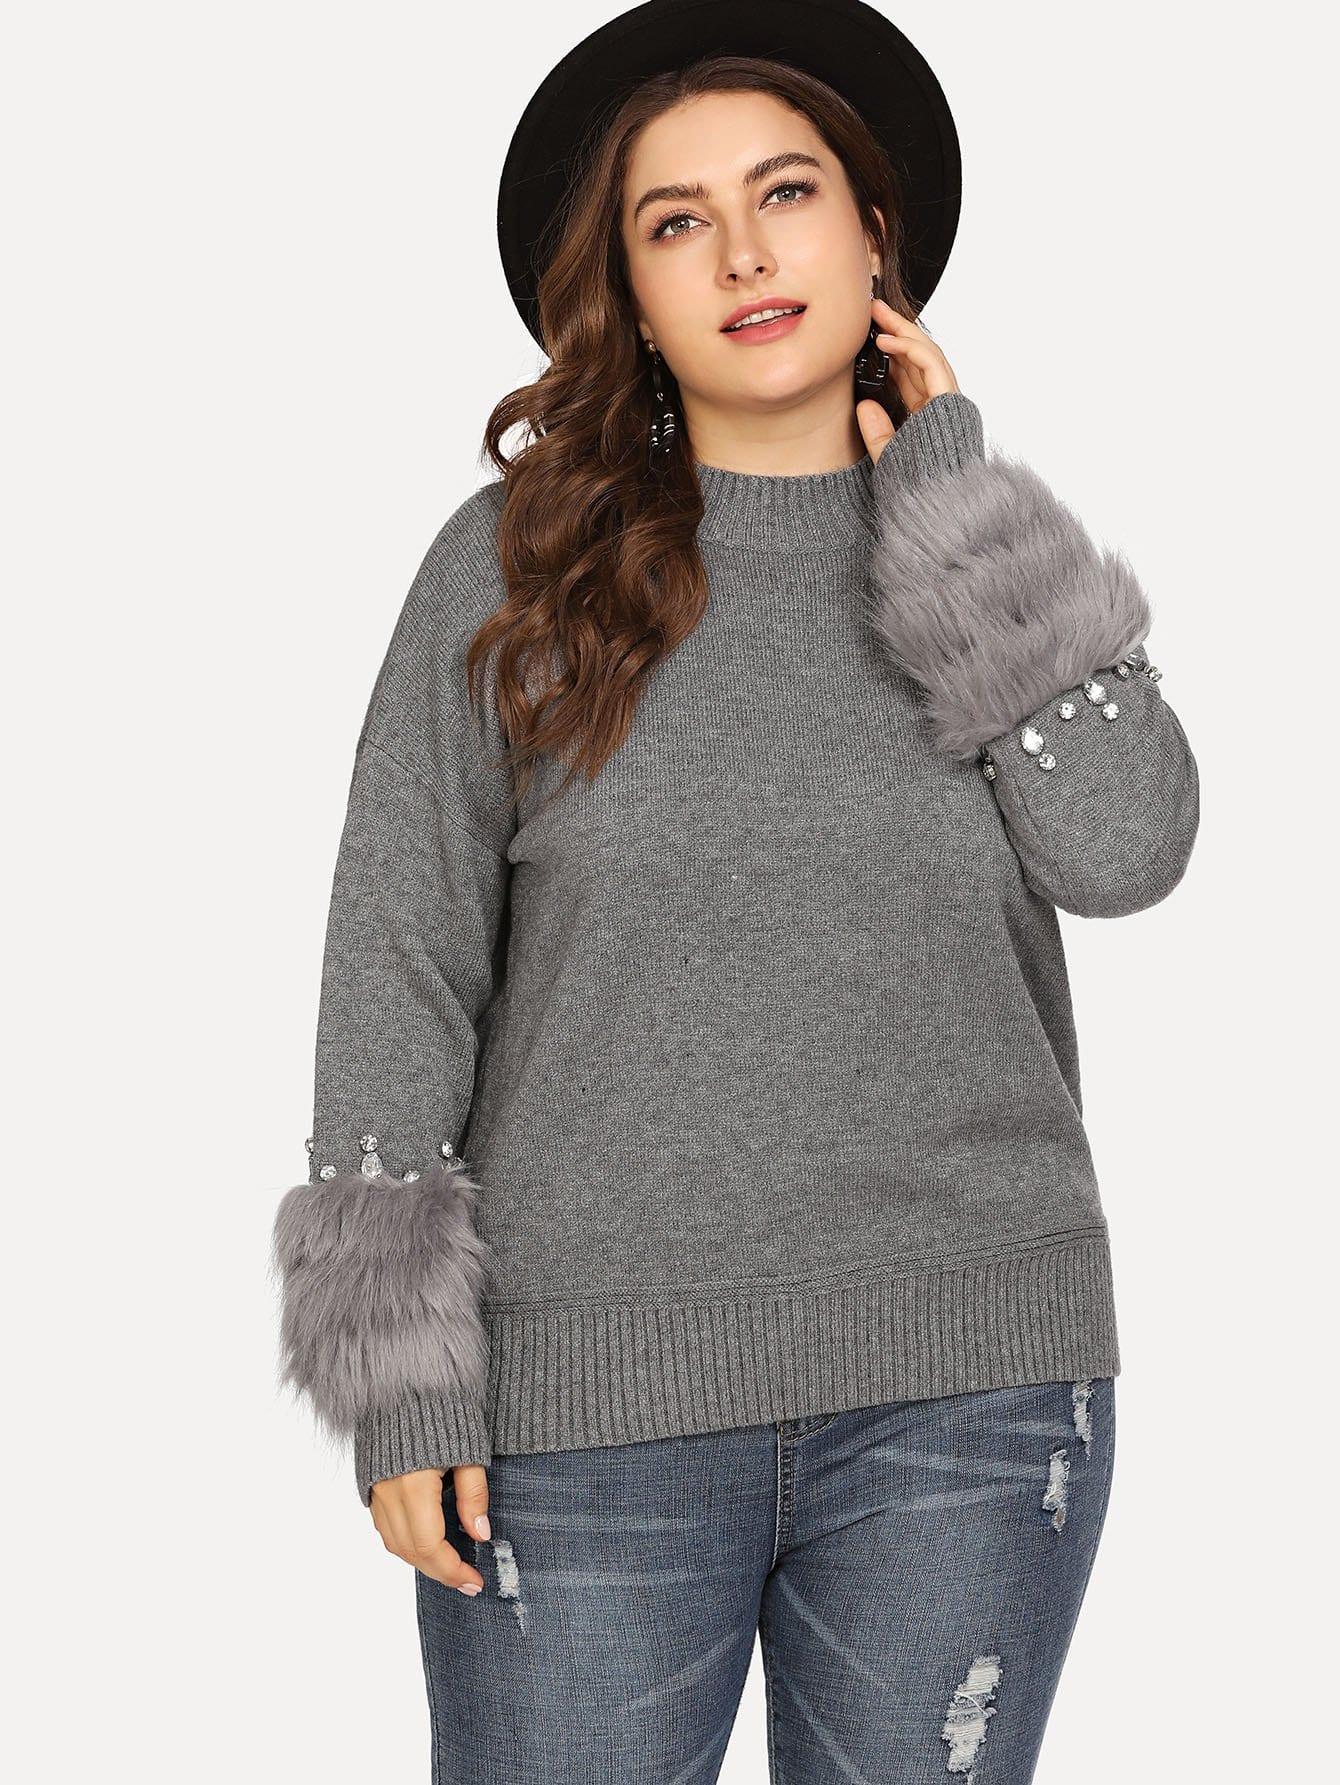 Купить Плюс Faux Fur & Rhinestone Embellished Sweater, Franziska, SheIn